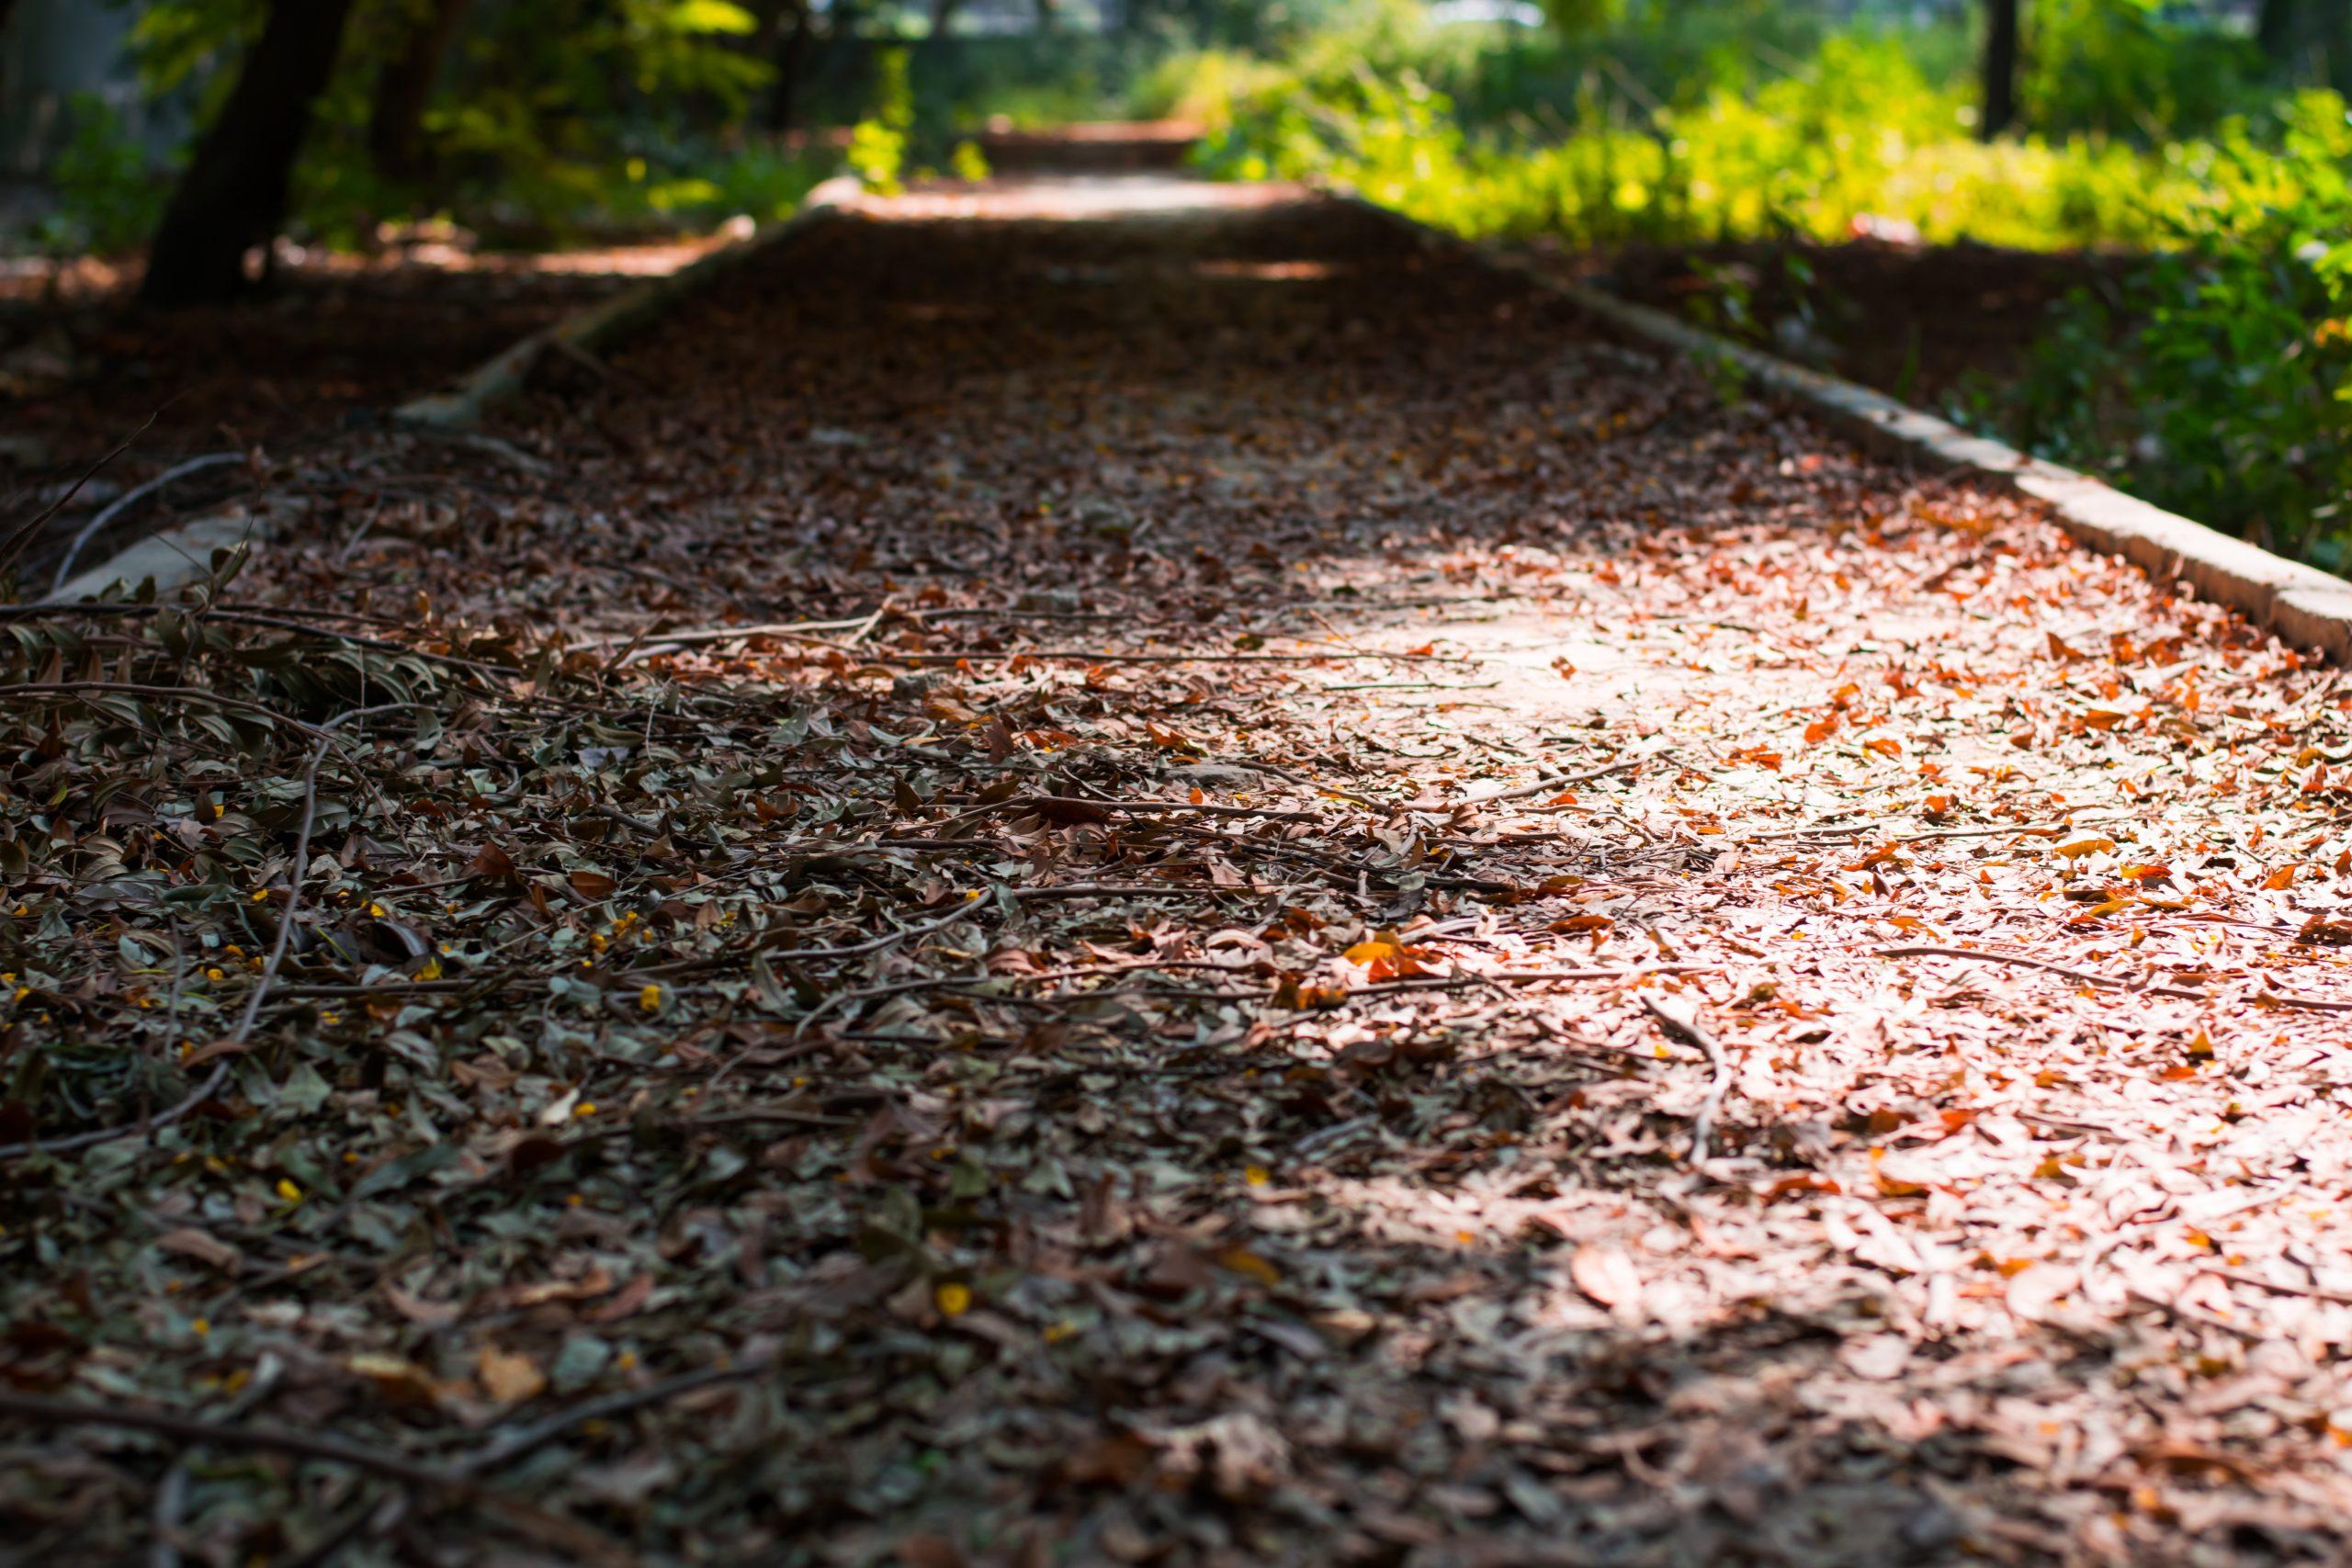 Foliage on a walkway